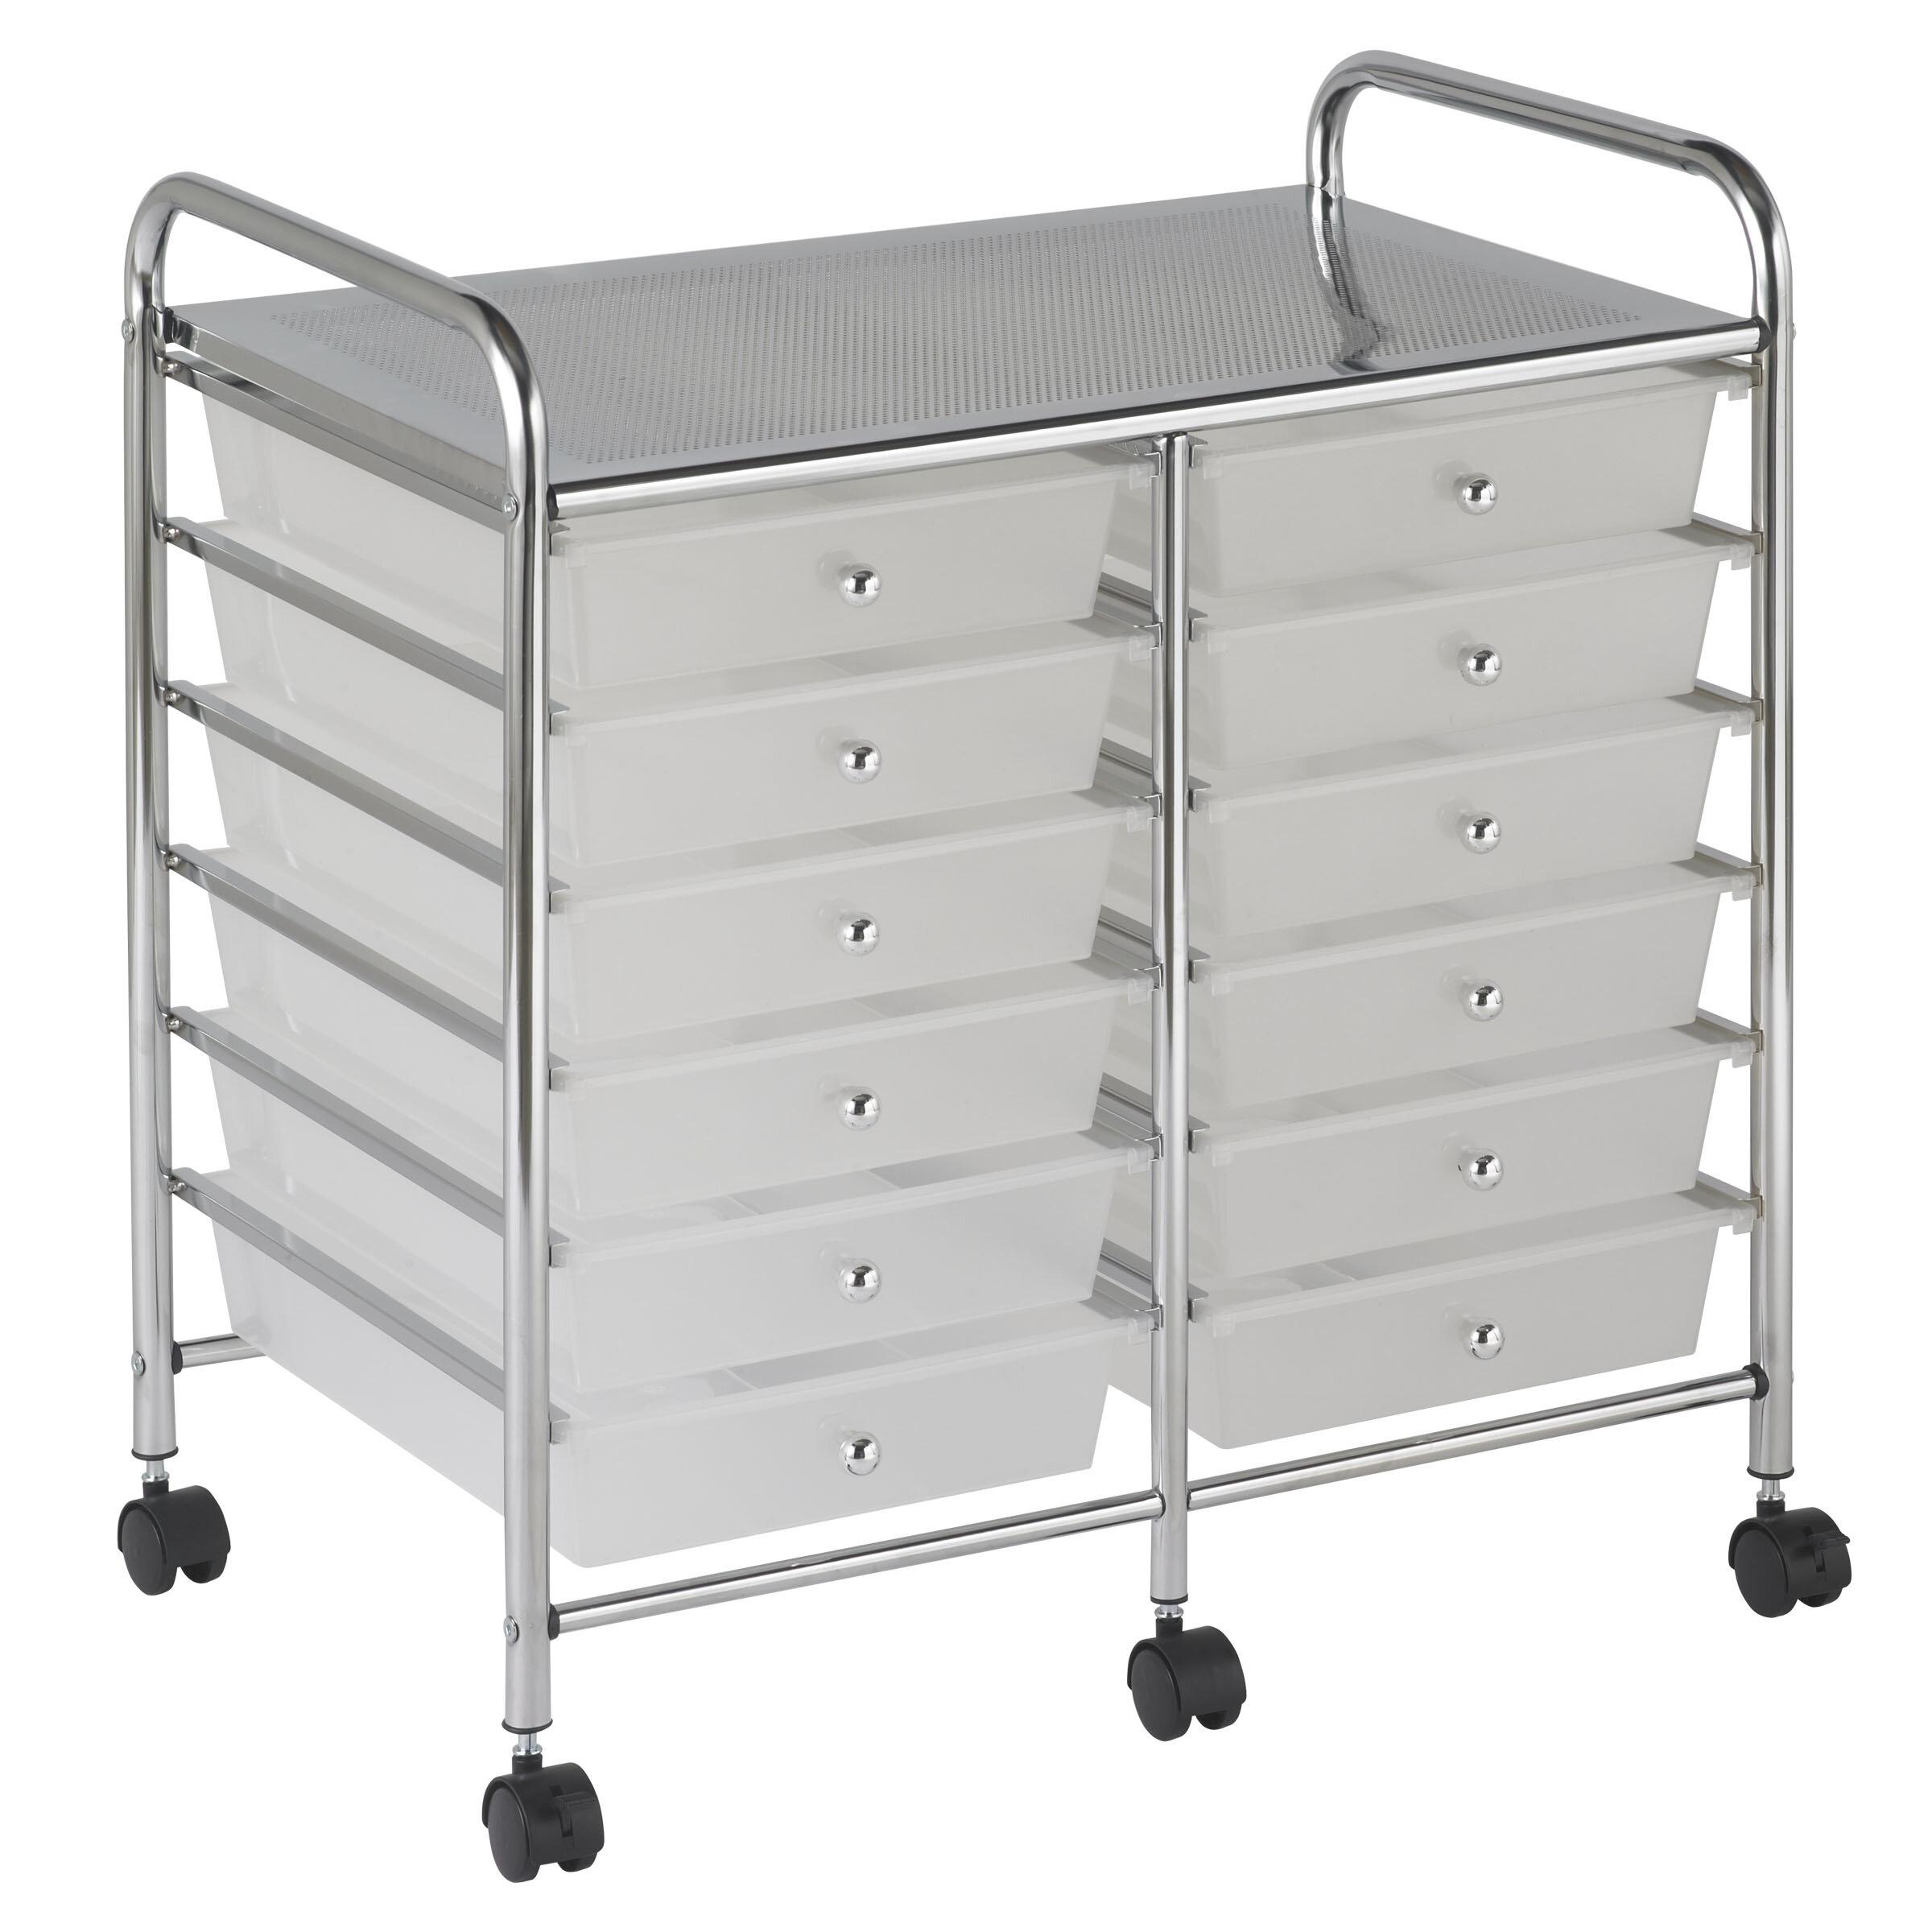 Ordinaire ECR4Kids 12 Drawer Storage Chest U0026 Reviews | Wayfair